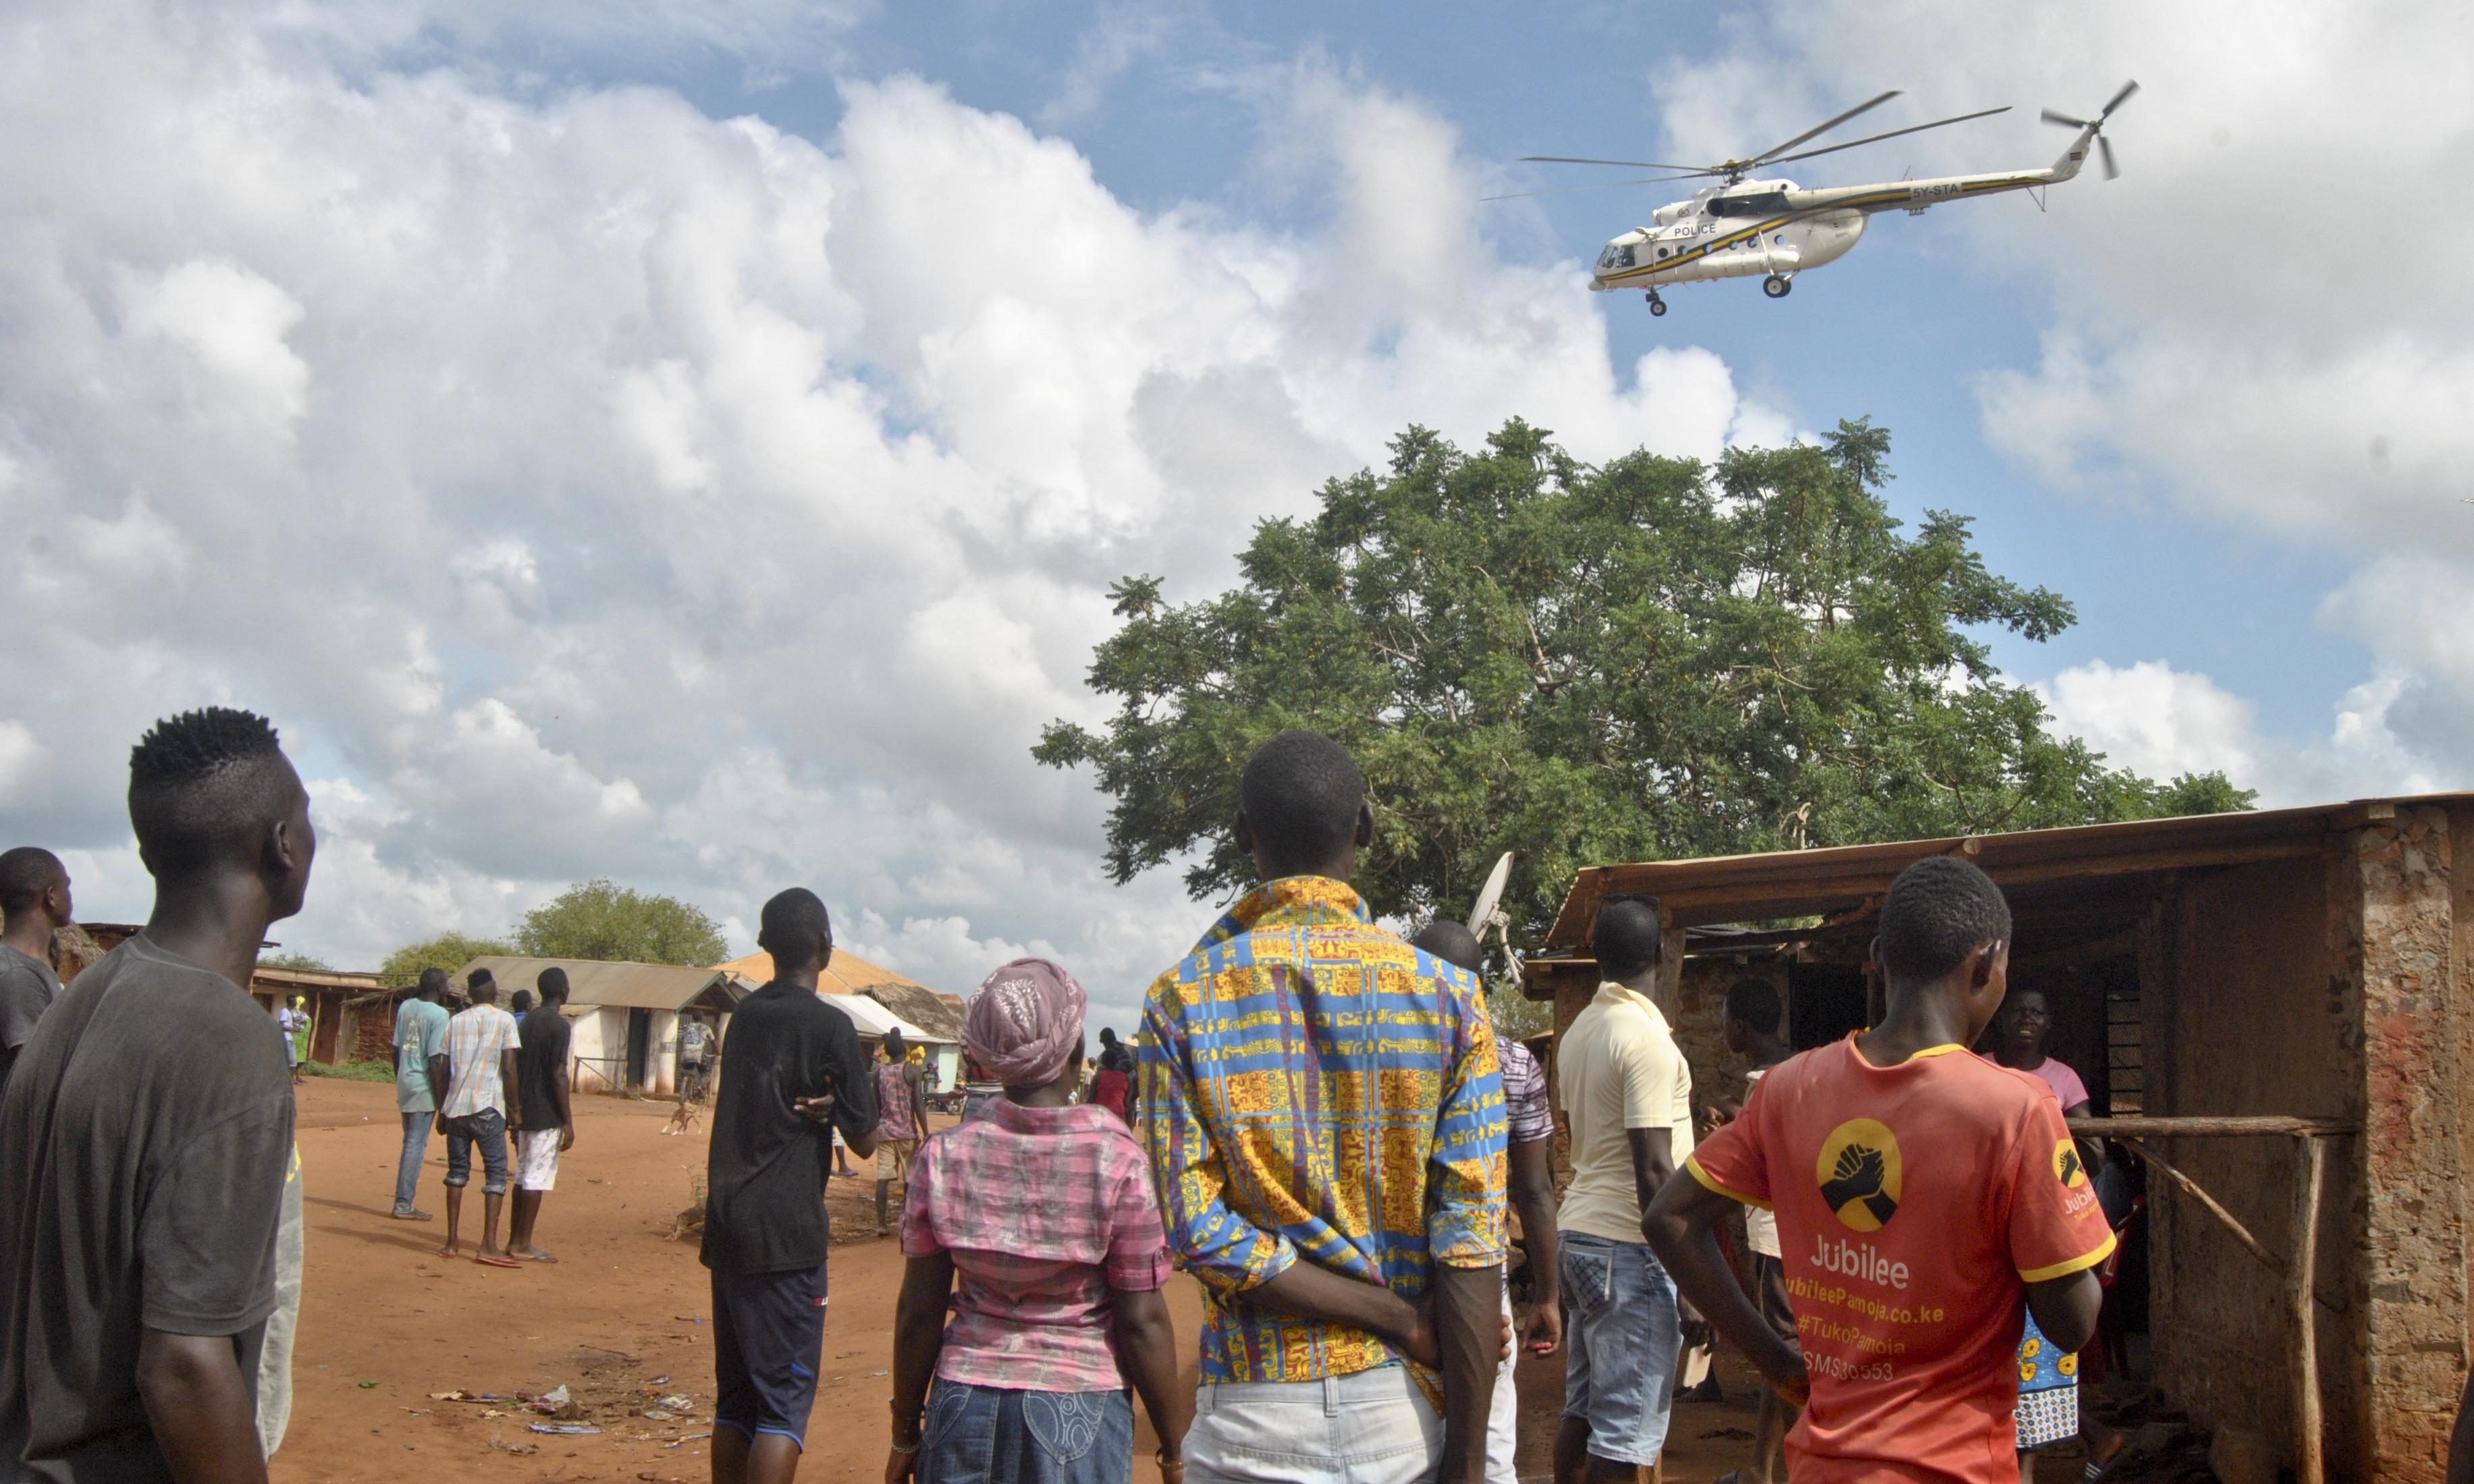 Gunmen kidnap Italian aid worker in Kenya